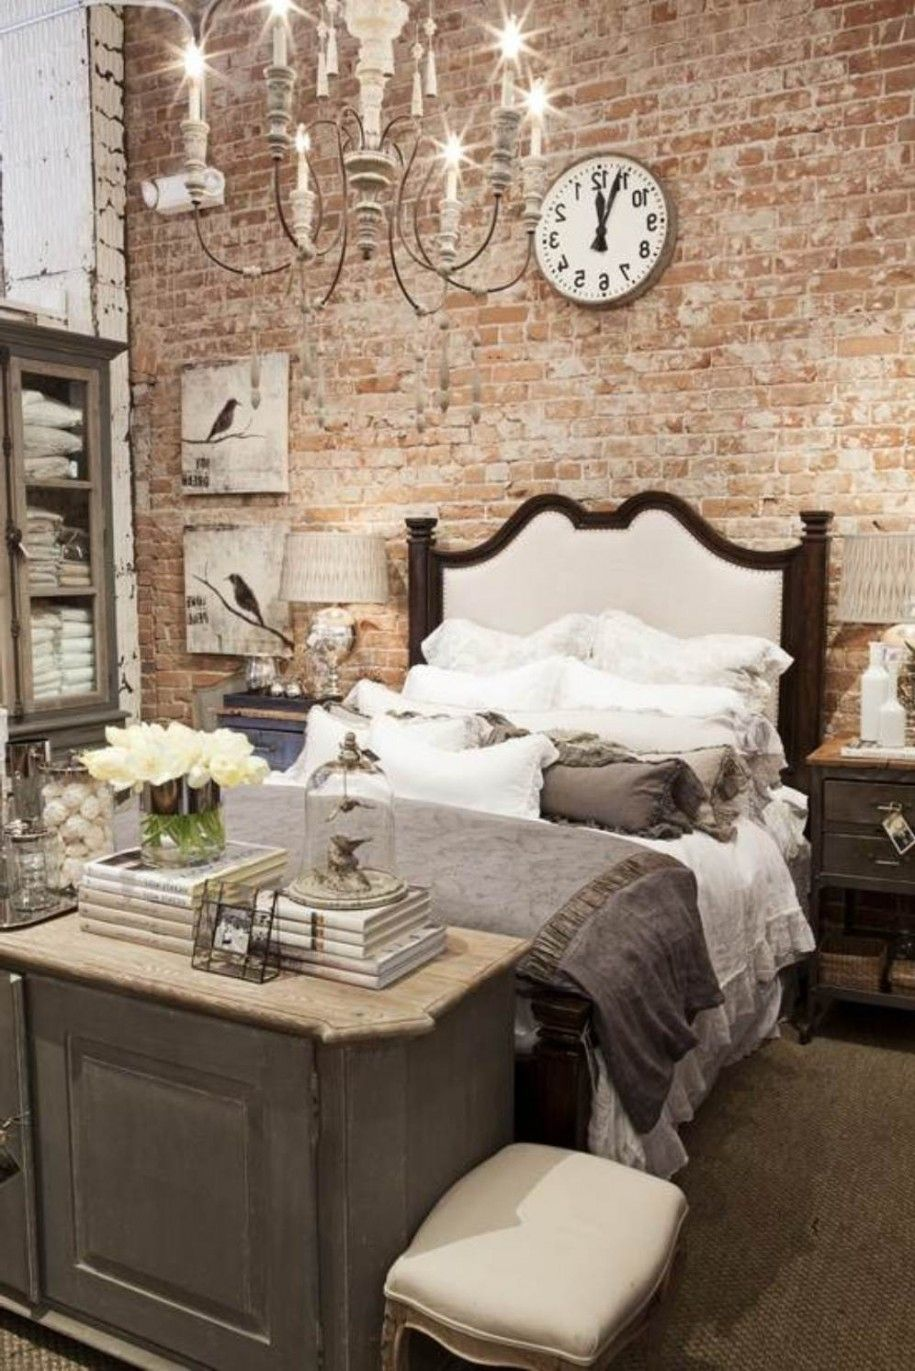 Romantic Bedroom Decorating Ideas | Bedroom: Rustic Design ...